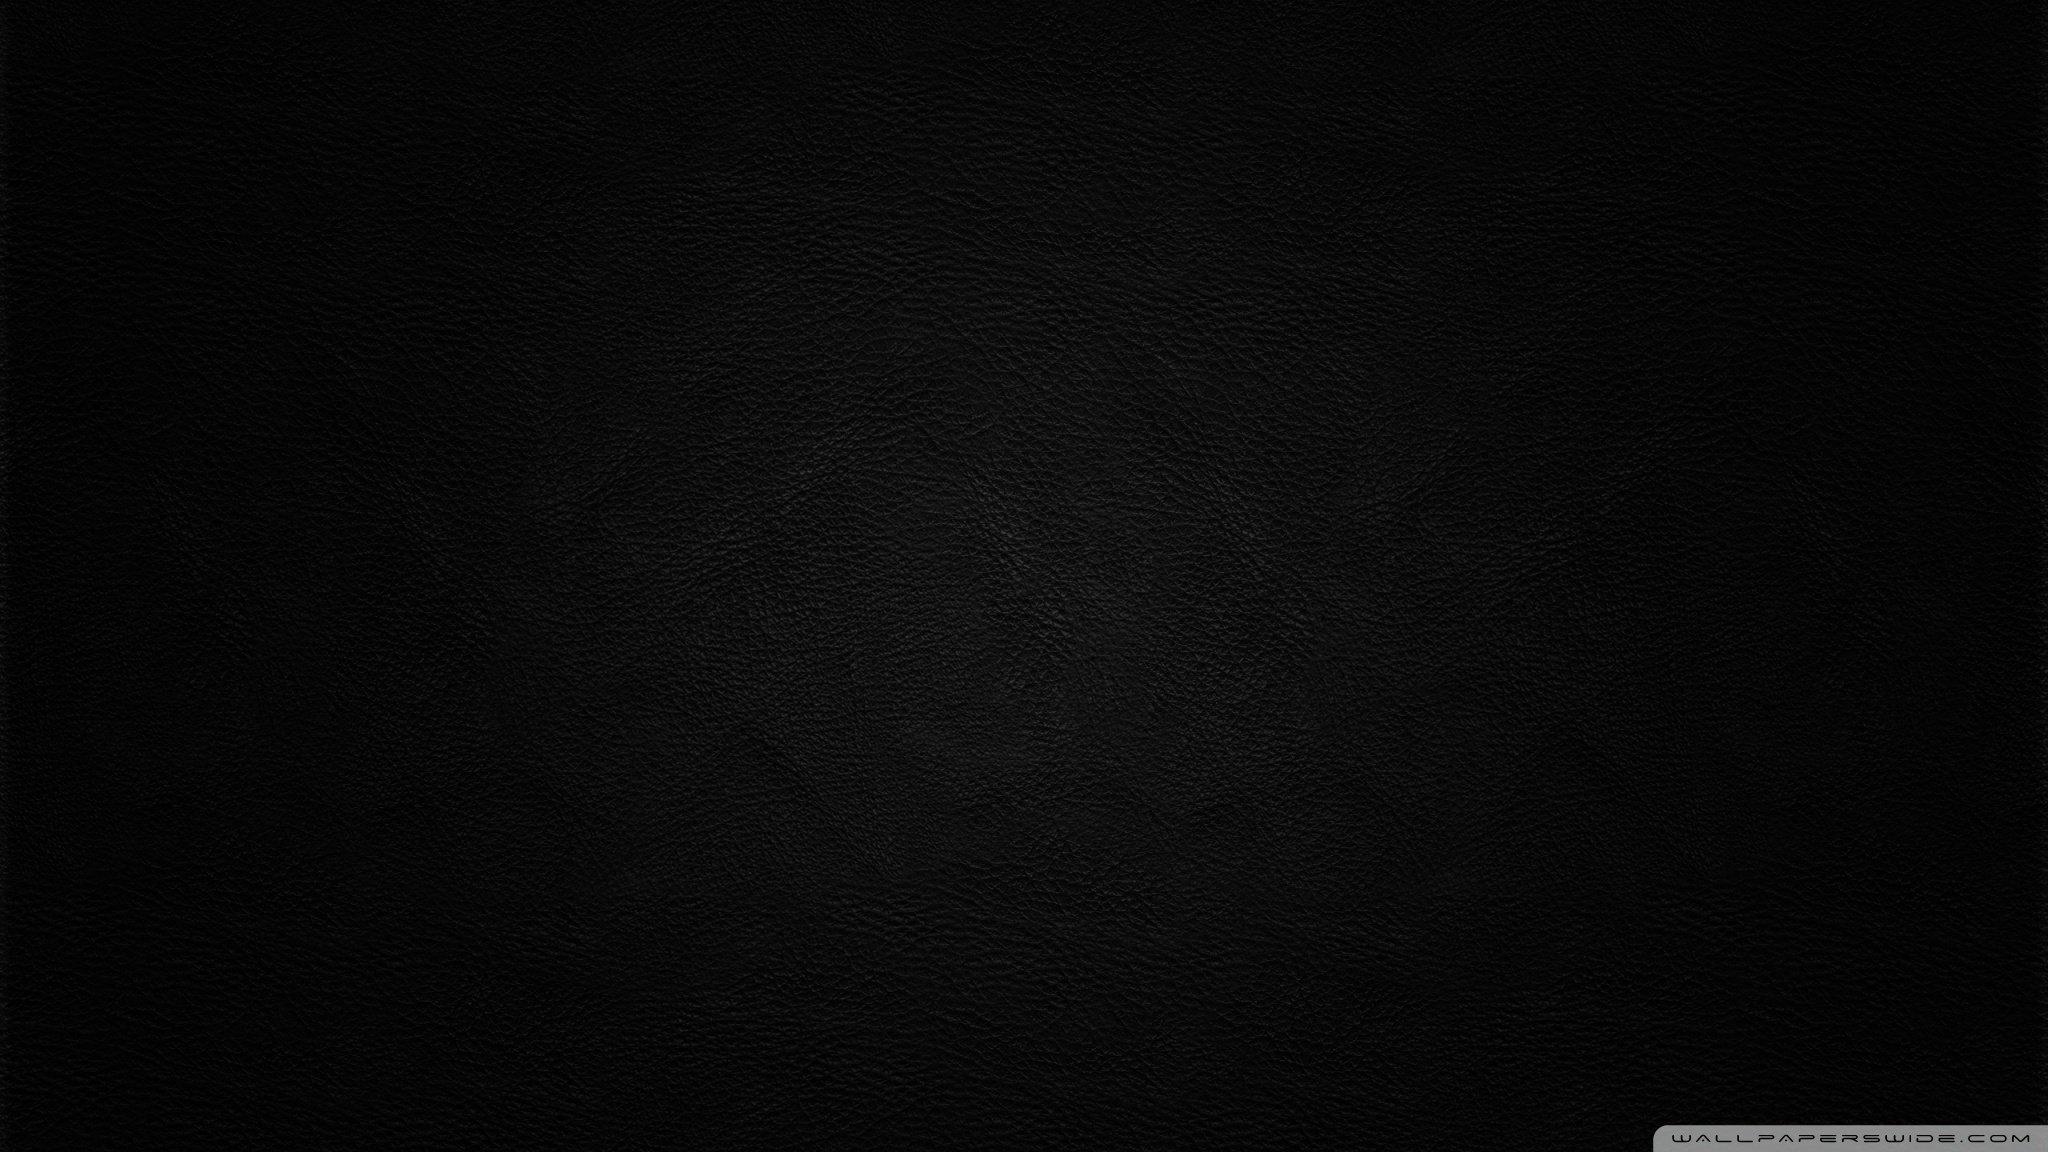 Image   Black background leather wallpaper 2048x1152jpg   Penumbra 2048x1152